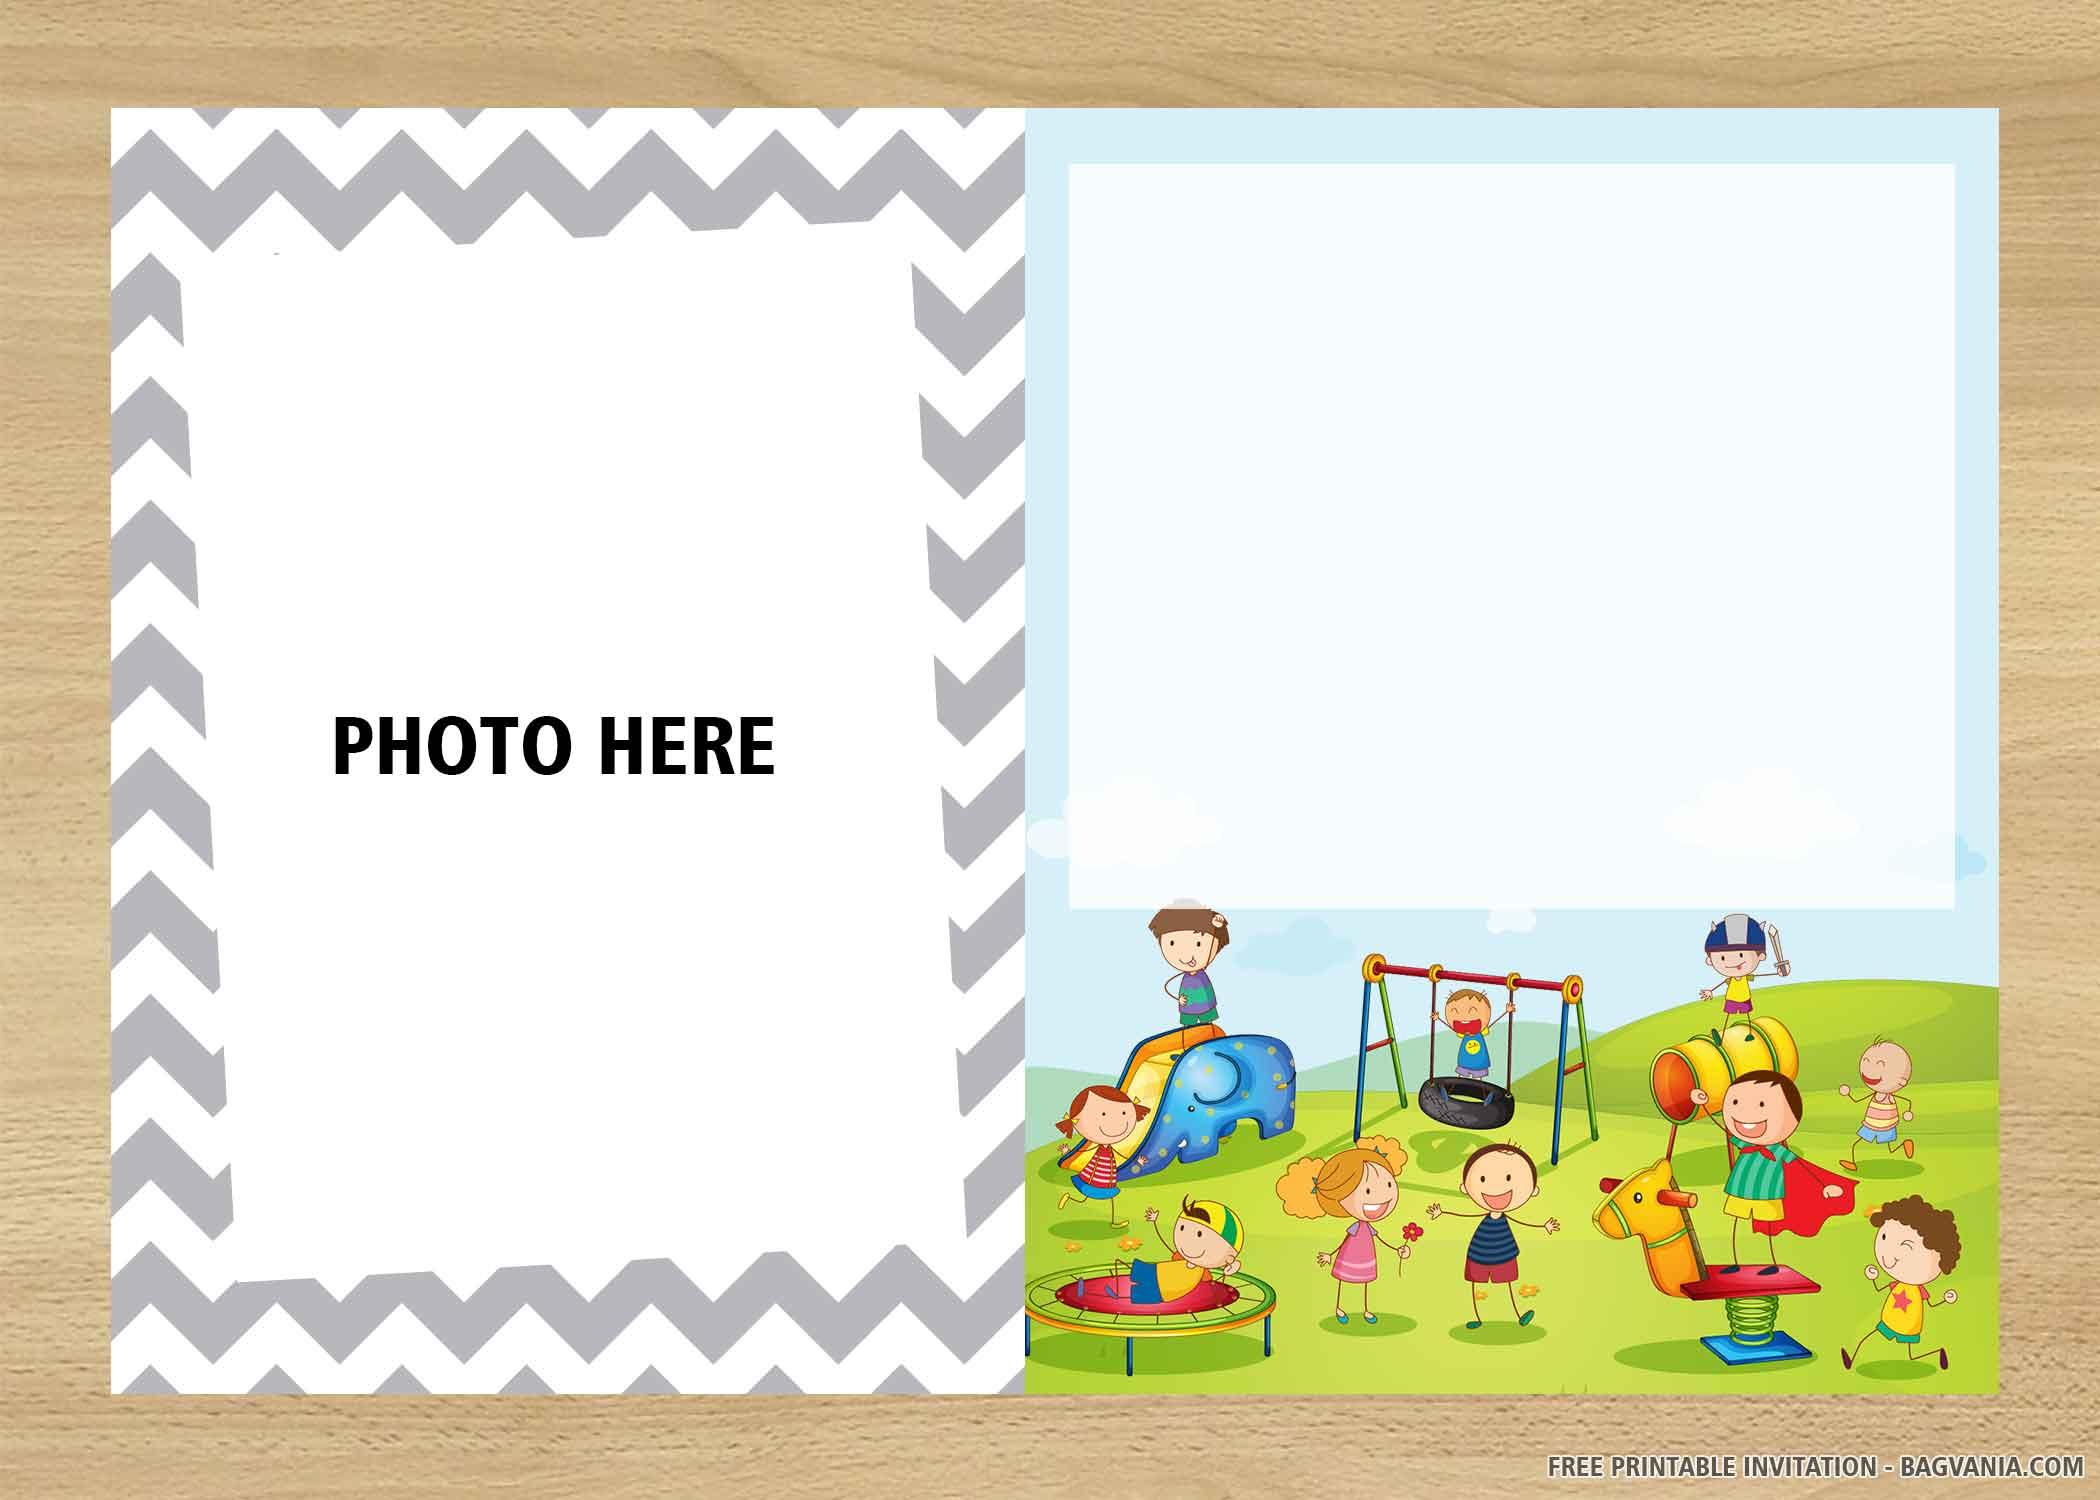 Free Printable Playground Birthday Invitation